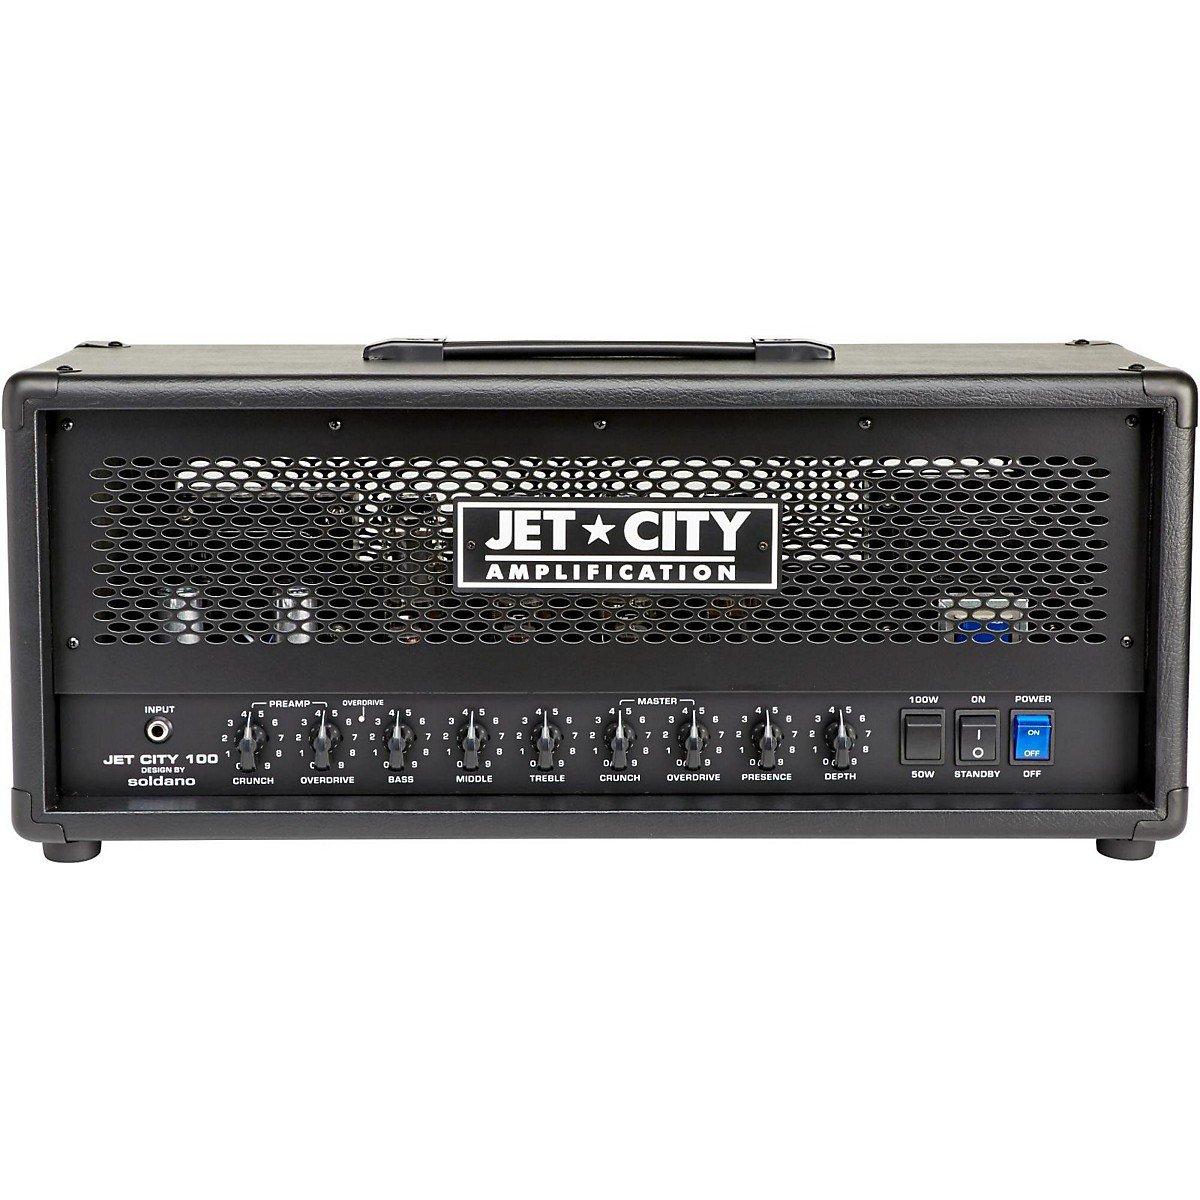 Jet City Amplification 100hdm 100w 2 Channel Head Make Original Guitar Amp Musical Instruments